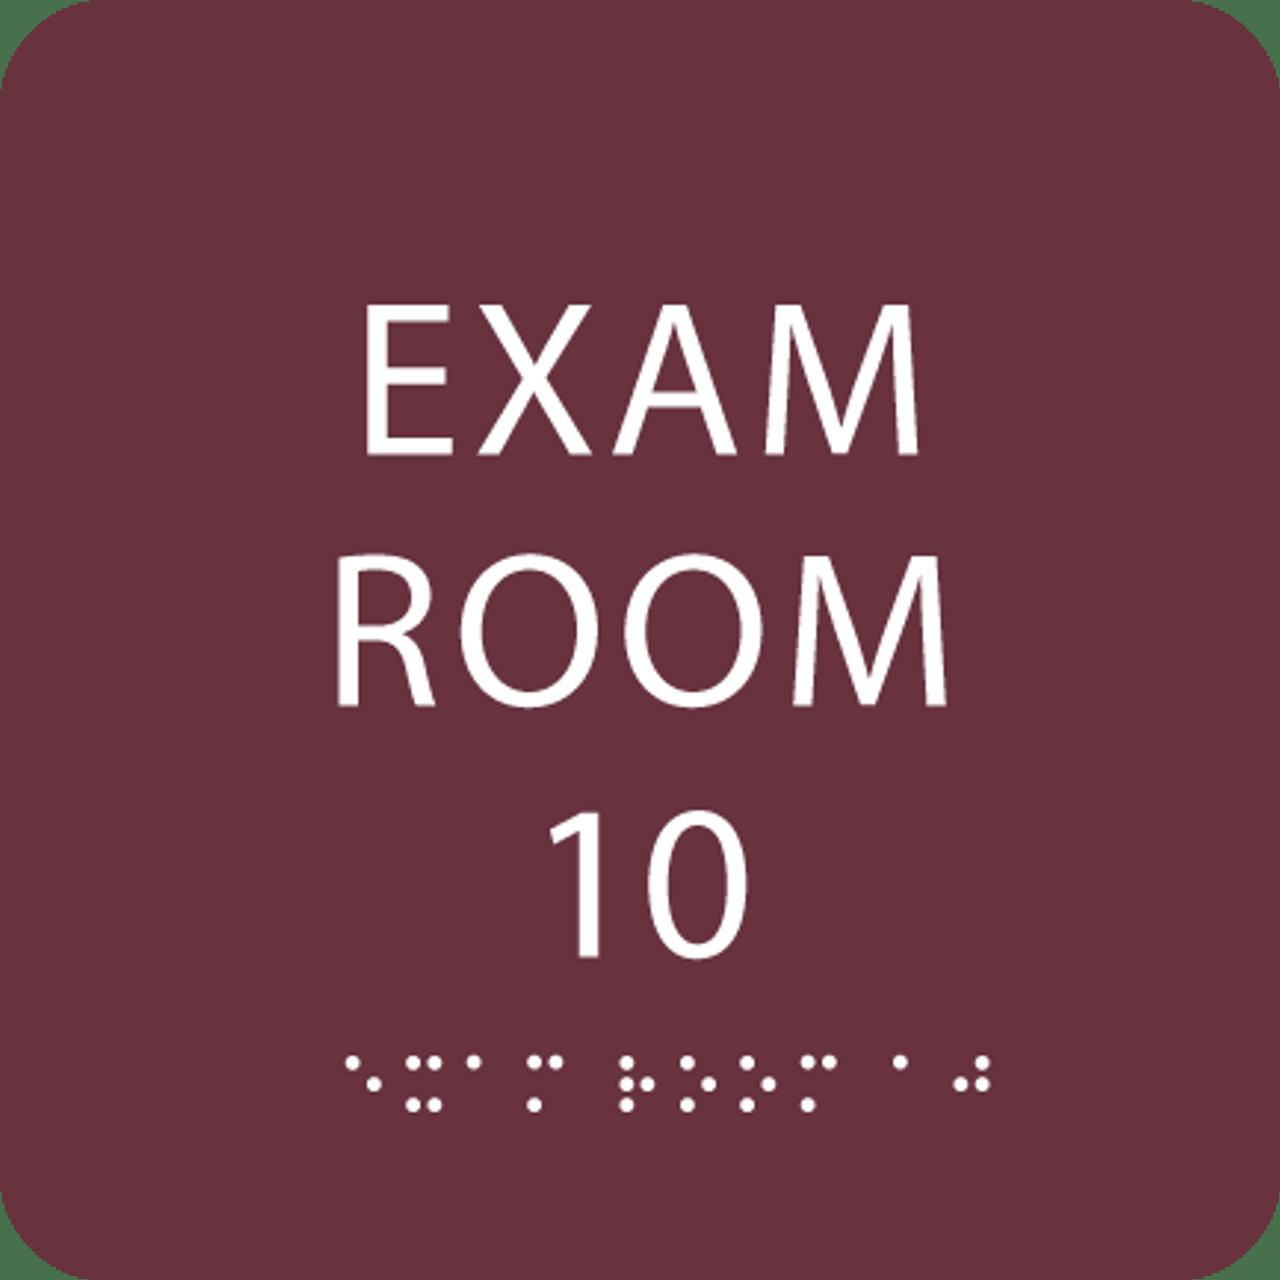 Burgundy Exam Room 10 Sign w/ ADA Braille